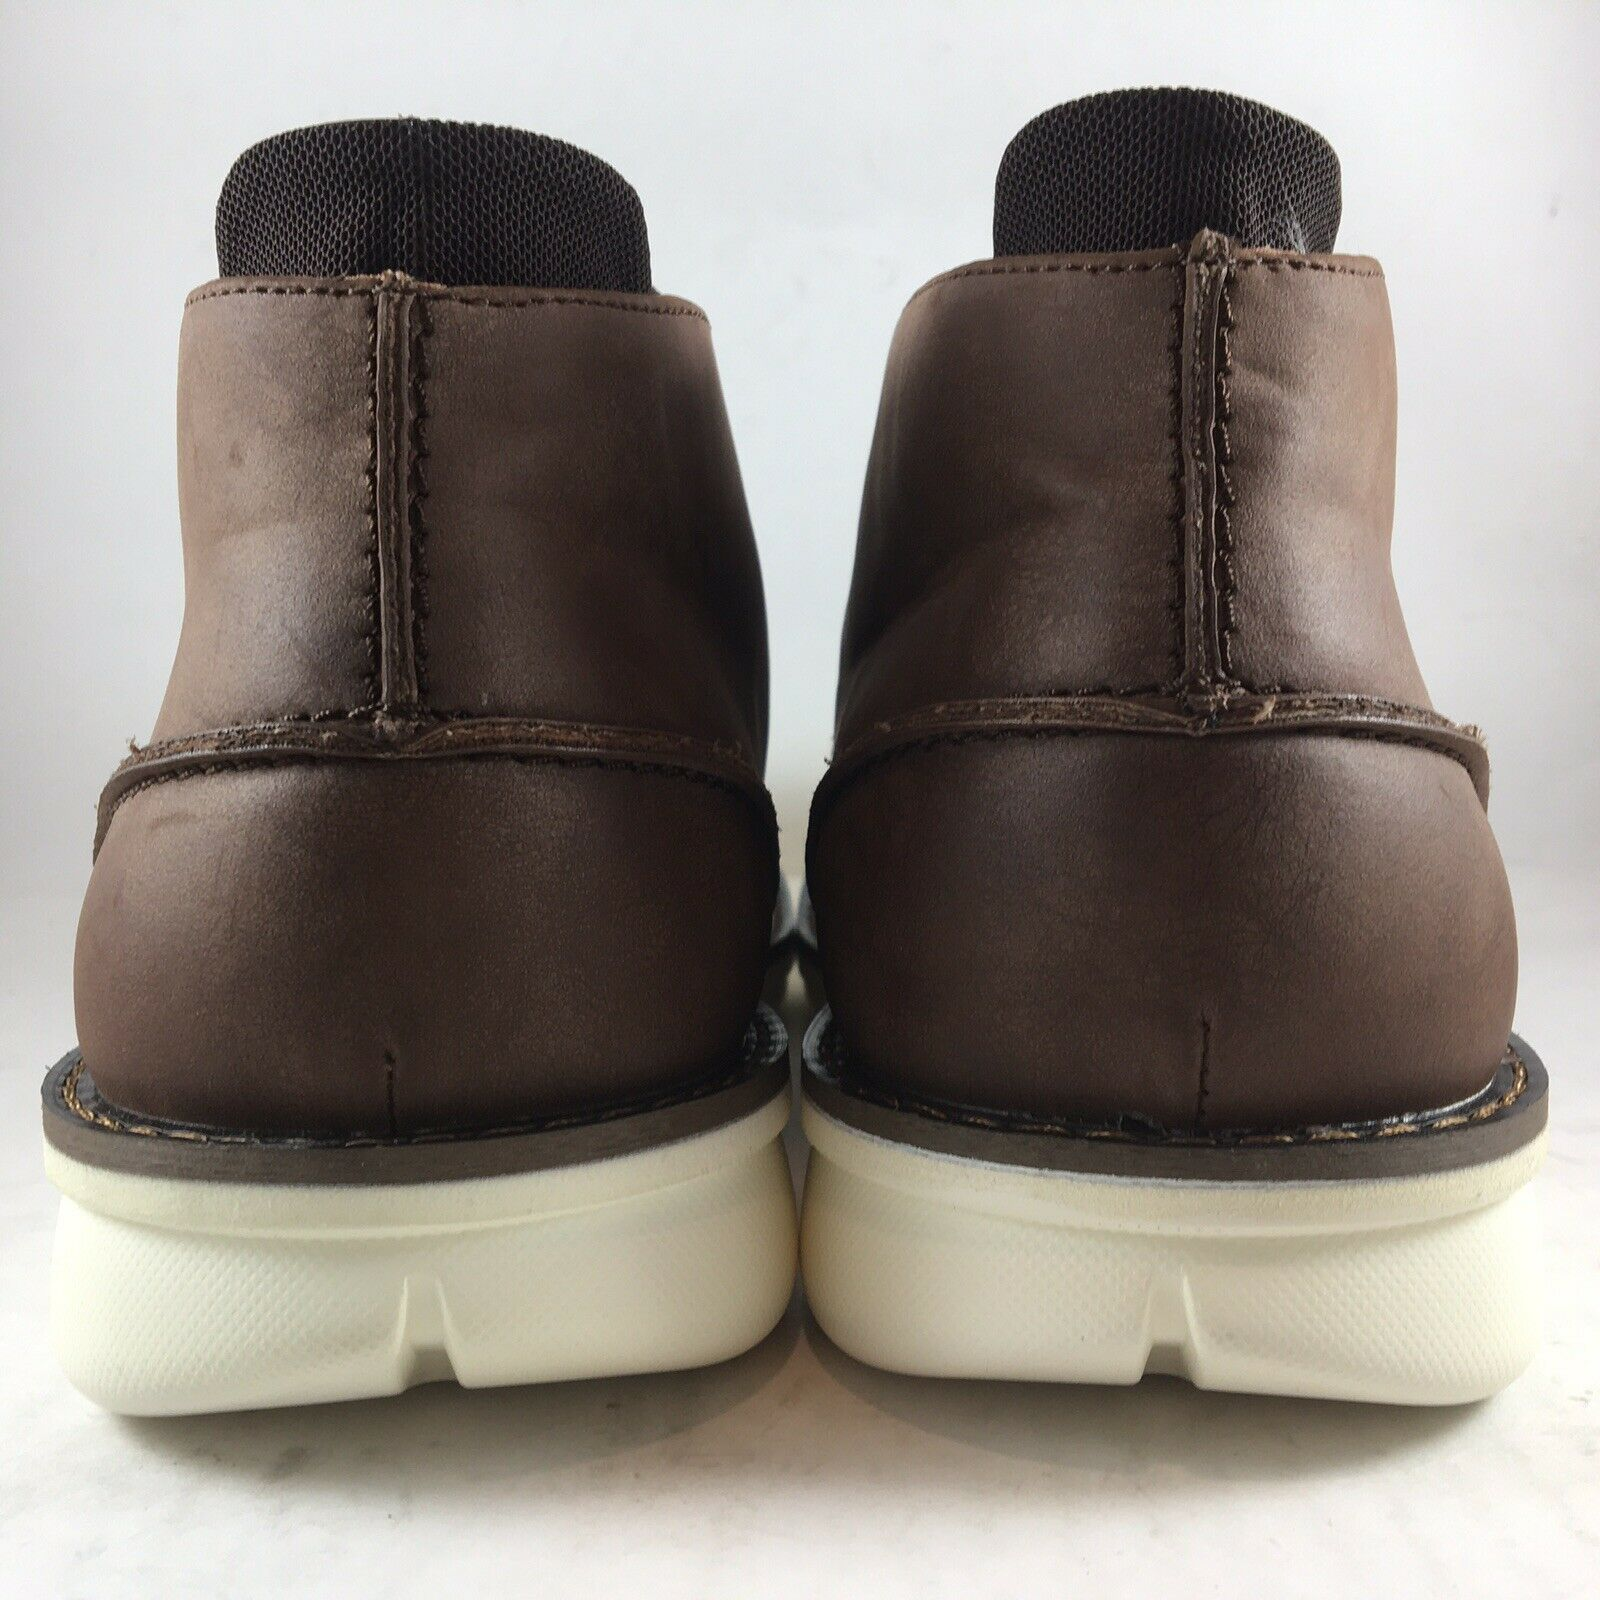 Reaction Kenneth Cole Chukkas Design 2113852 Size US 10 M EU 43 UK 9